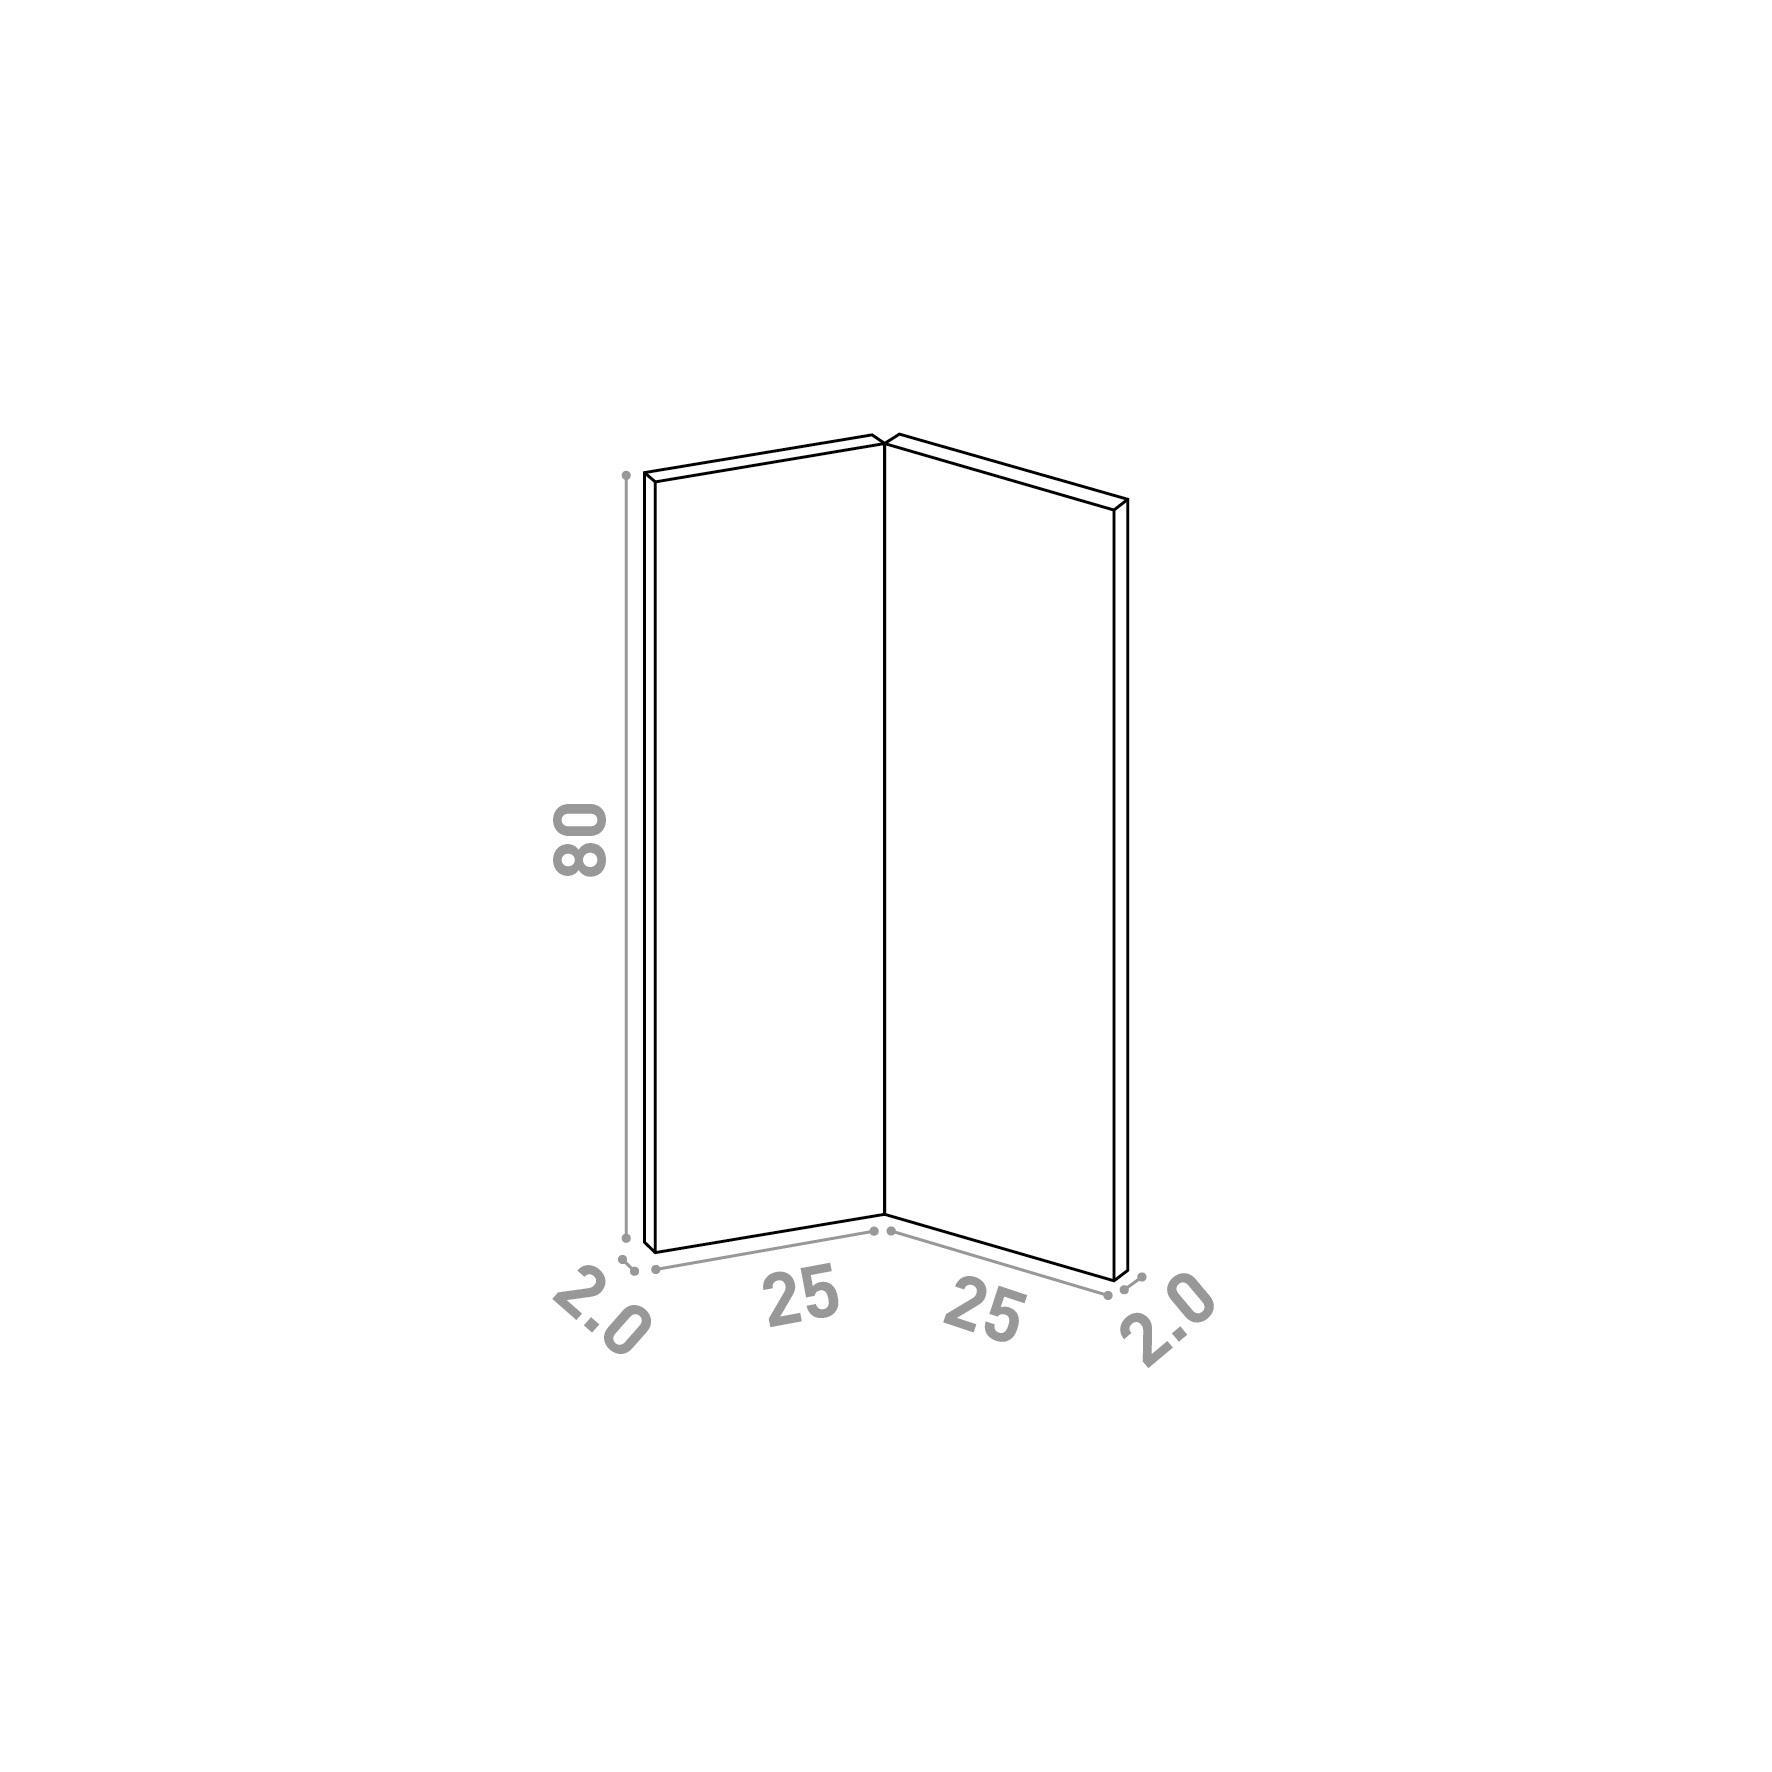 Porte d'angle 25x80cm   design lisse   noyer naturel